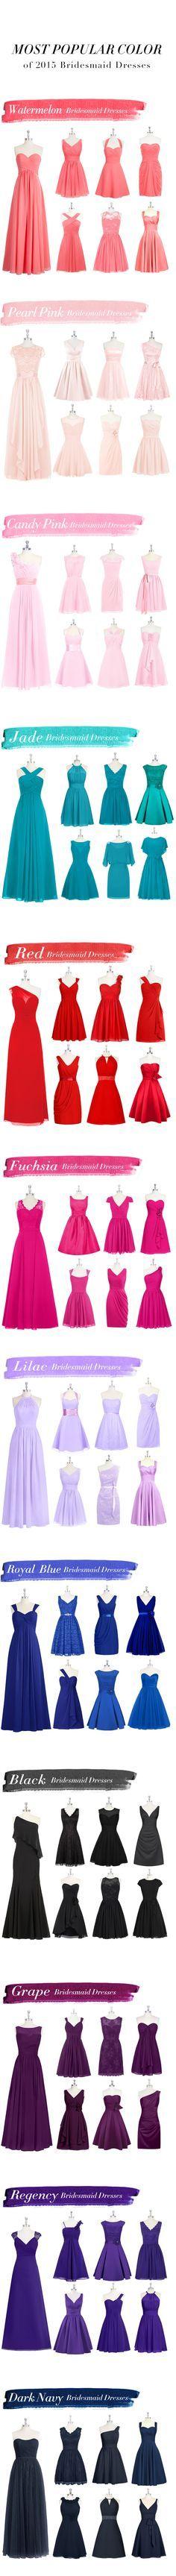 Mejores 20 imágenes de What to wear? en Pinterest   Vestidos de ...